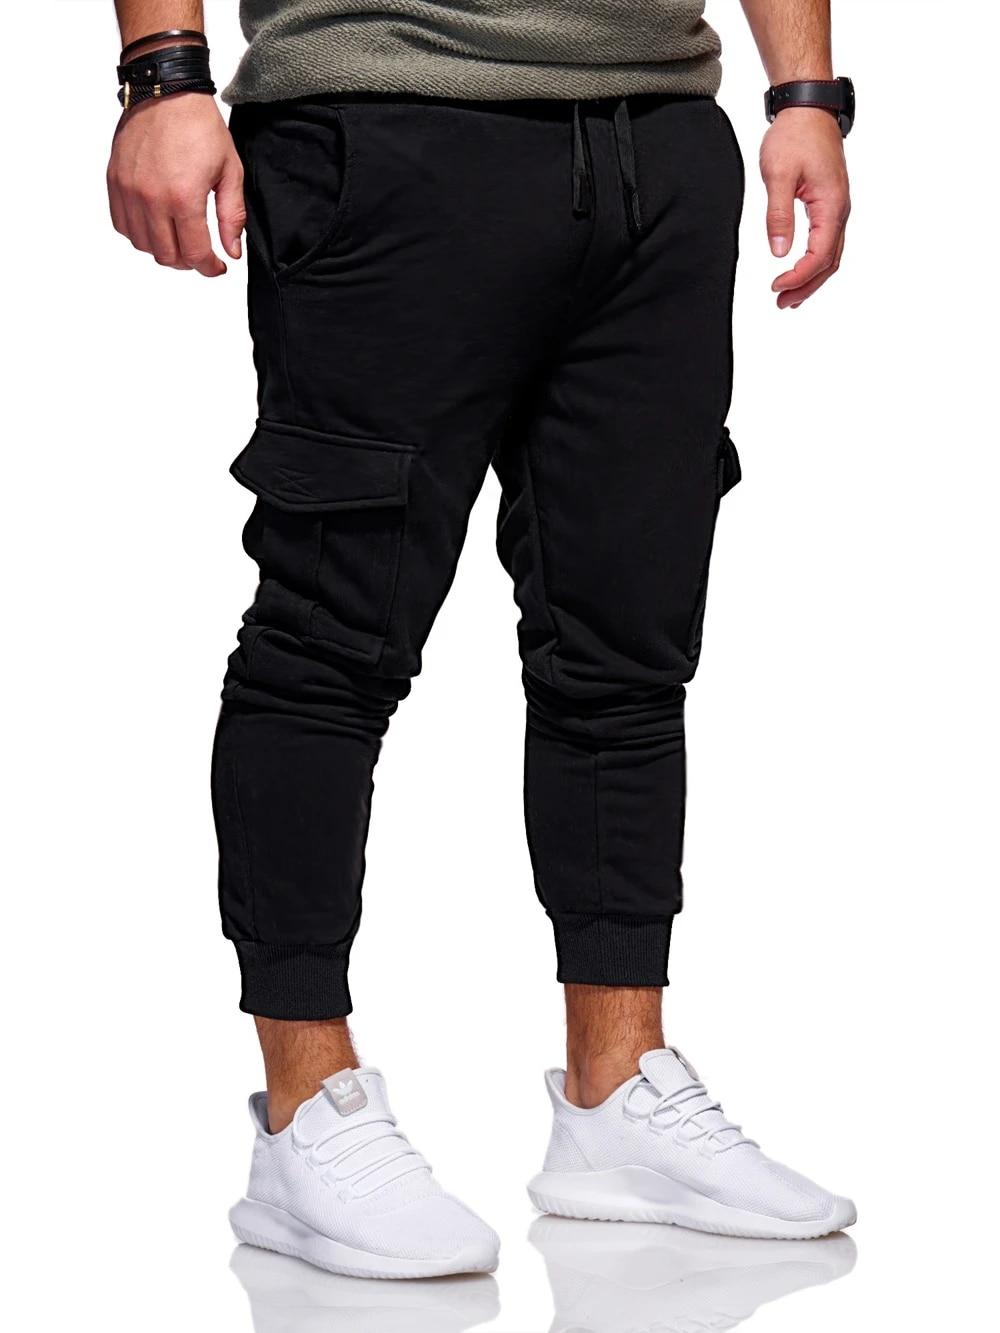 Pantalones Para Hombre Nueva Moda Hombre Jogger Pantalones Hombre Fitness Bodybuilding Gyms Pantalones Para Corredores Ropa Otono Pantalones De Chandal Pantalones Deportivos Aliexpress